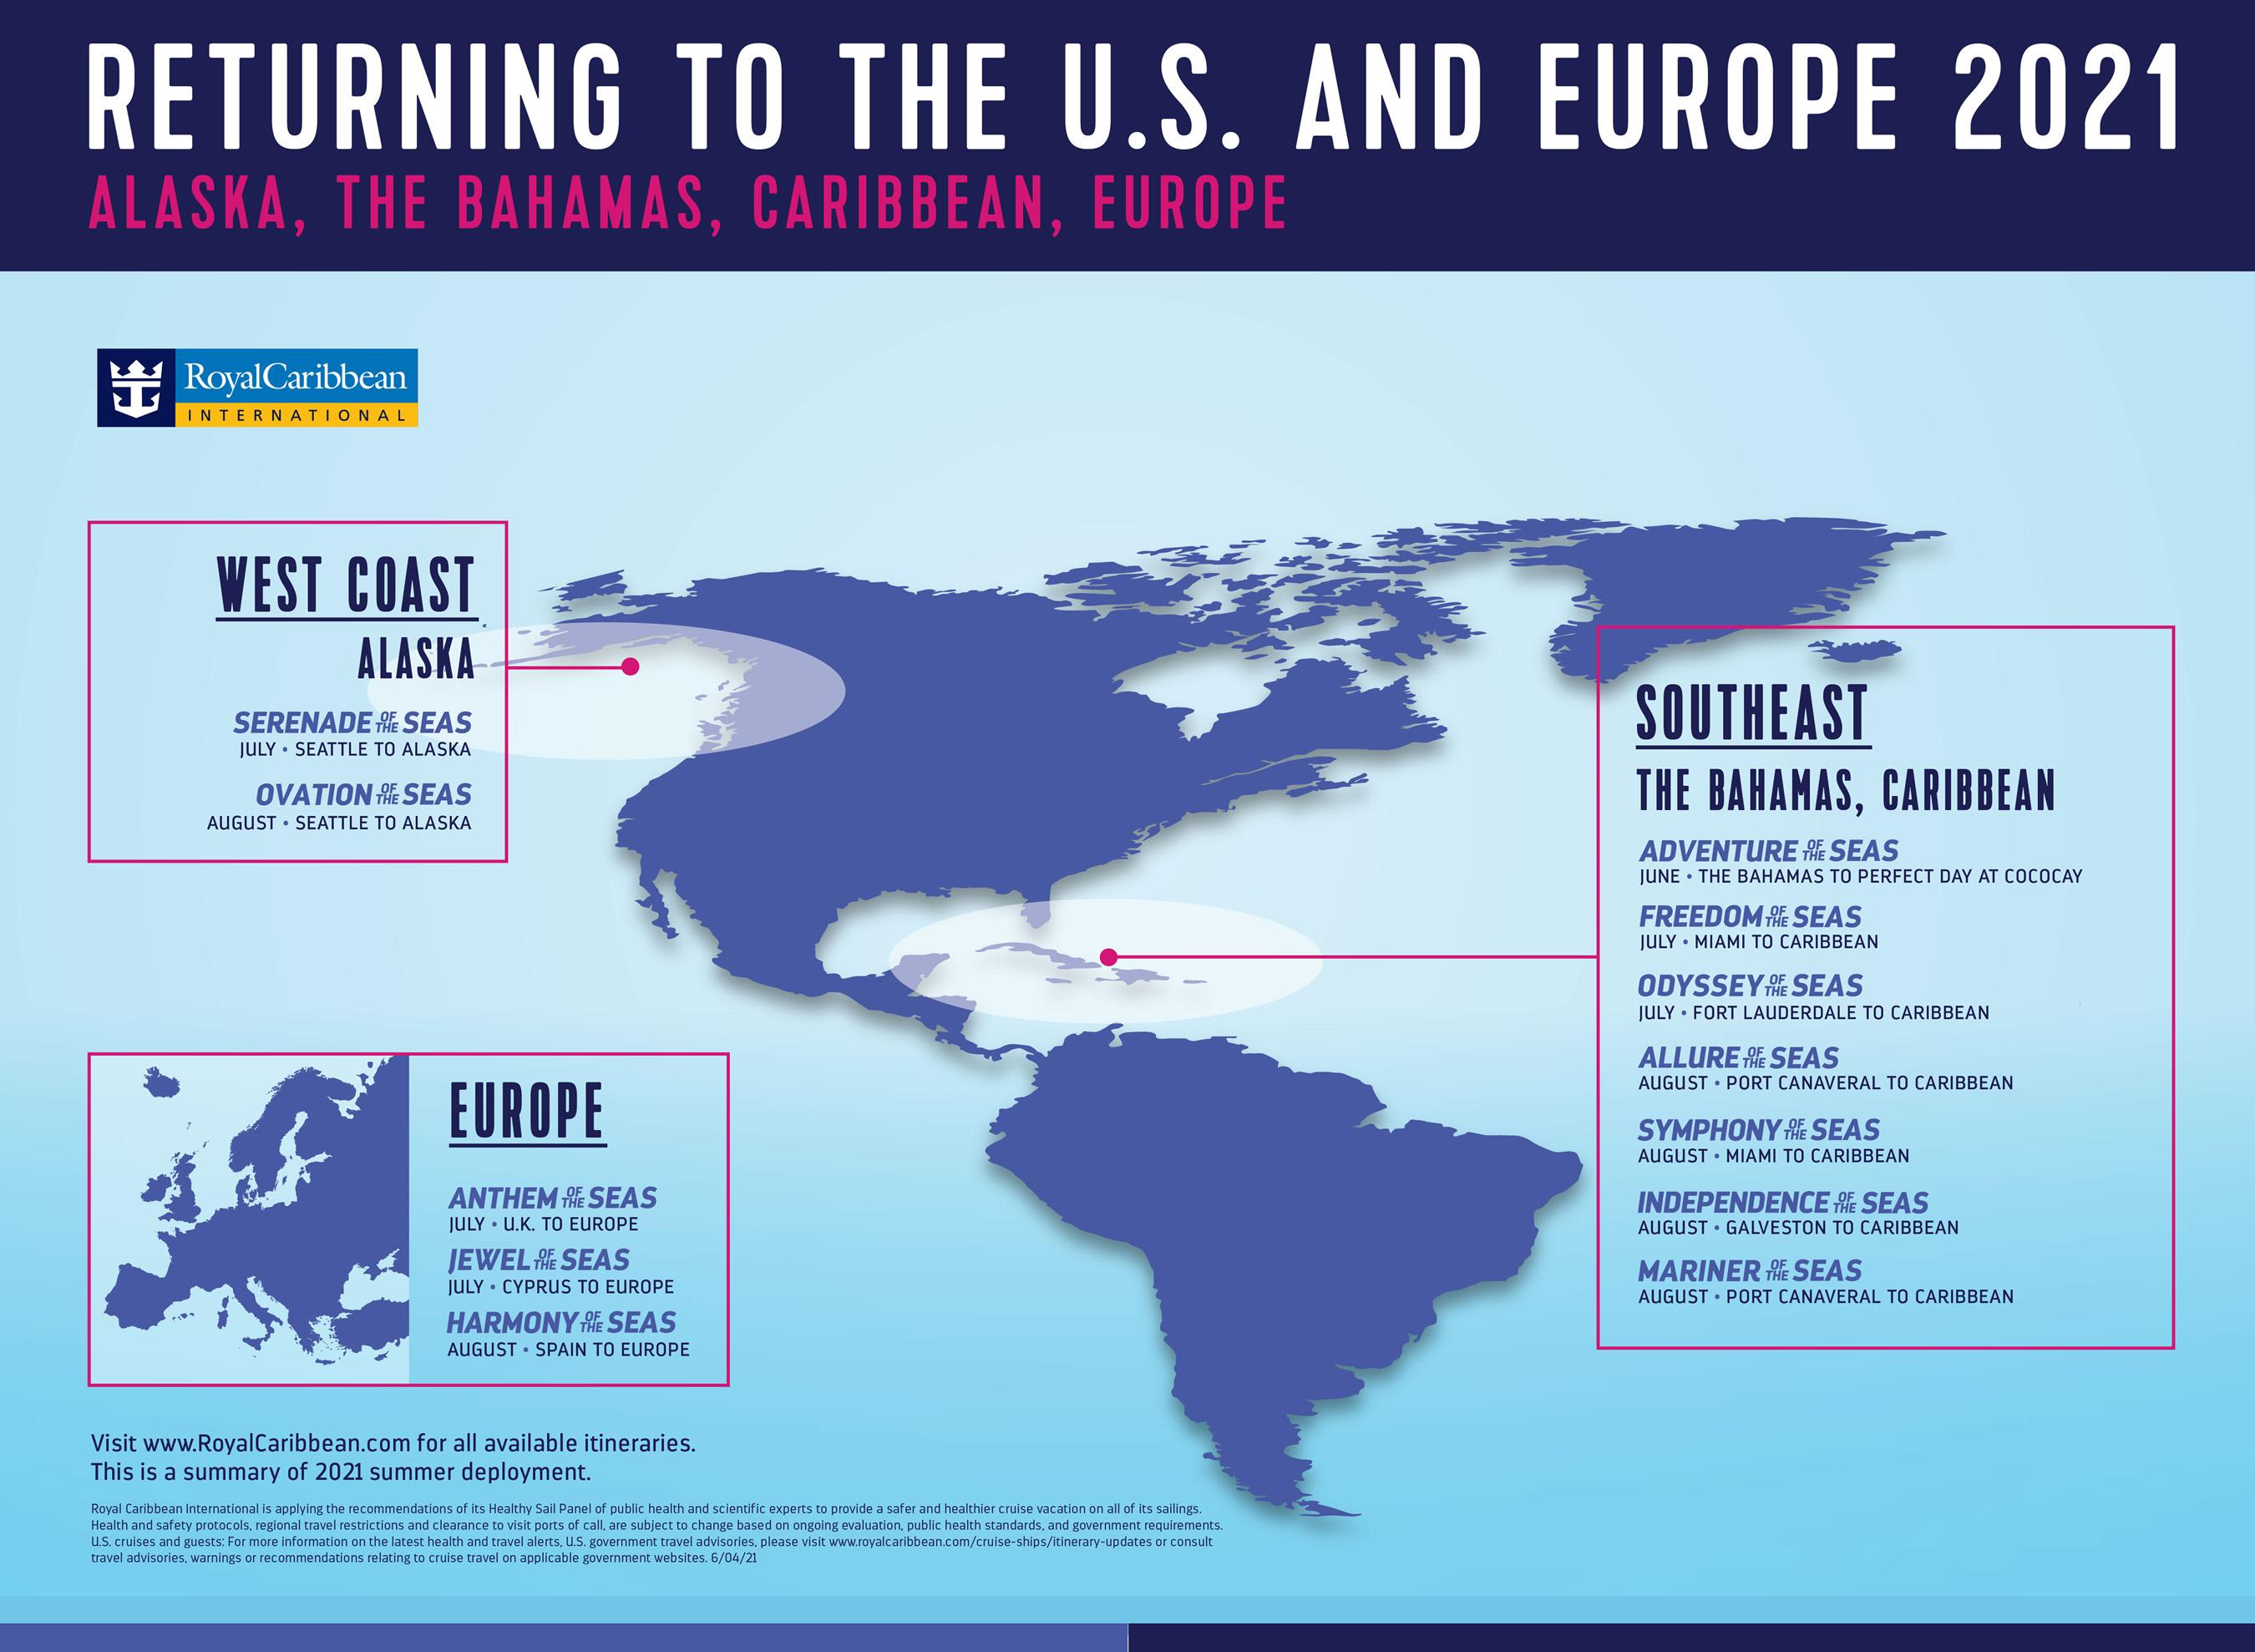 Royal Caribbean International's 2021 U.S. and Europe Summer Return Lineup.